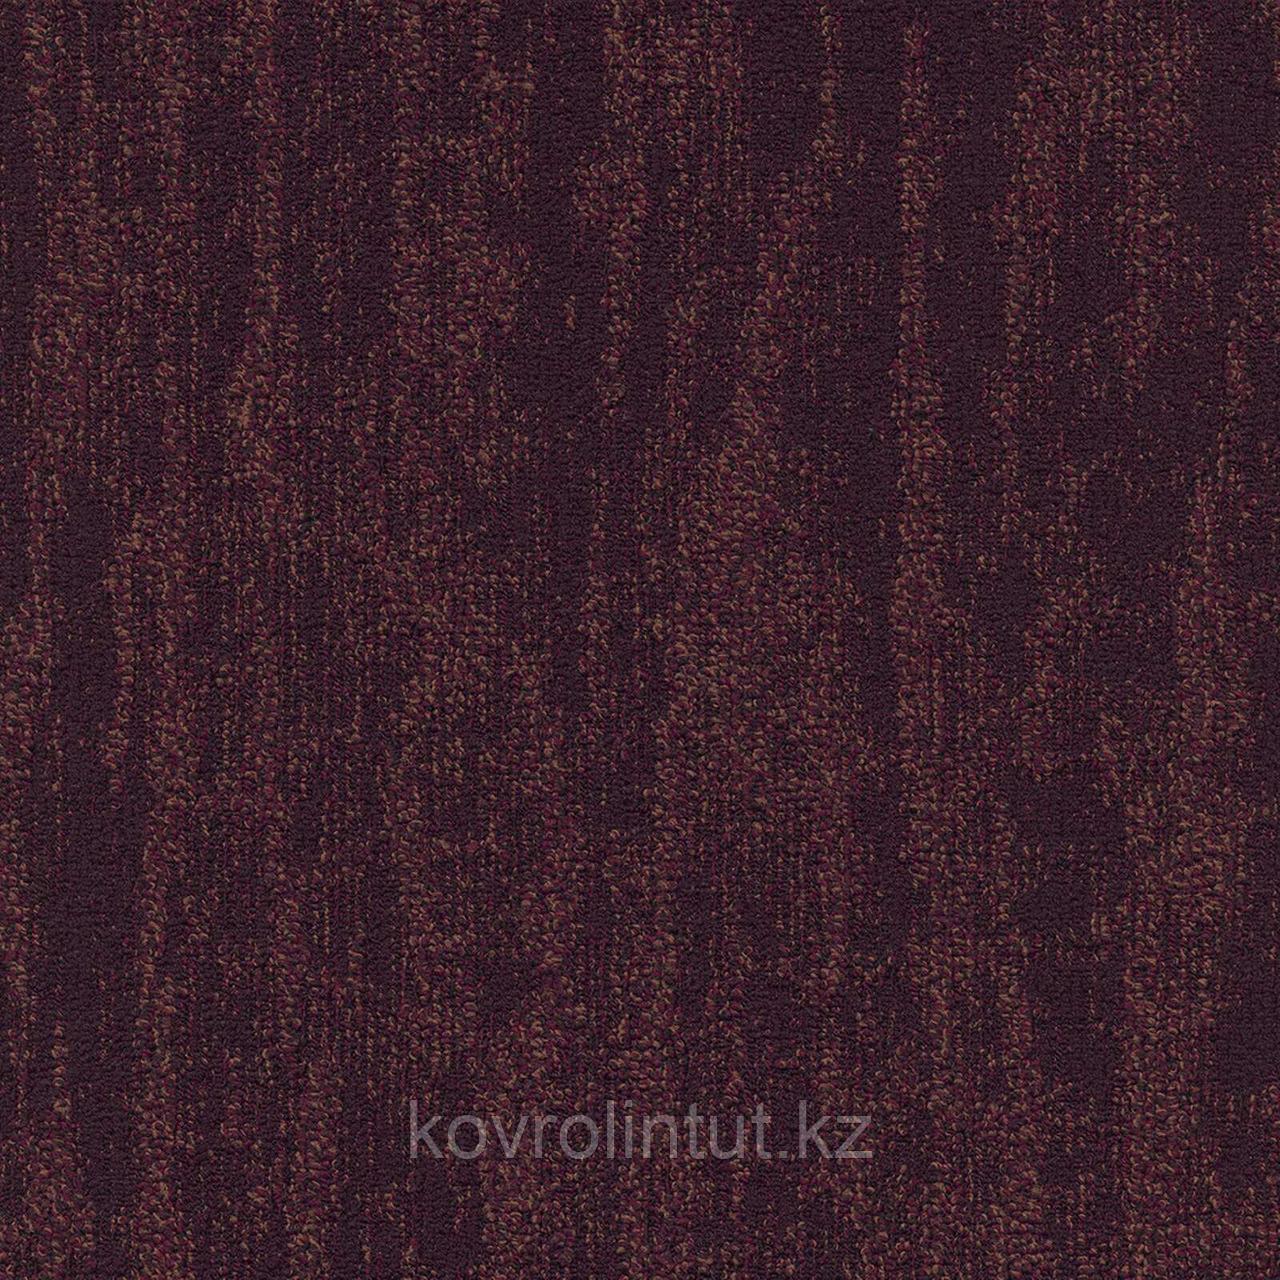 Плитка ковровая Modulyss Willow 352, 100% PA